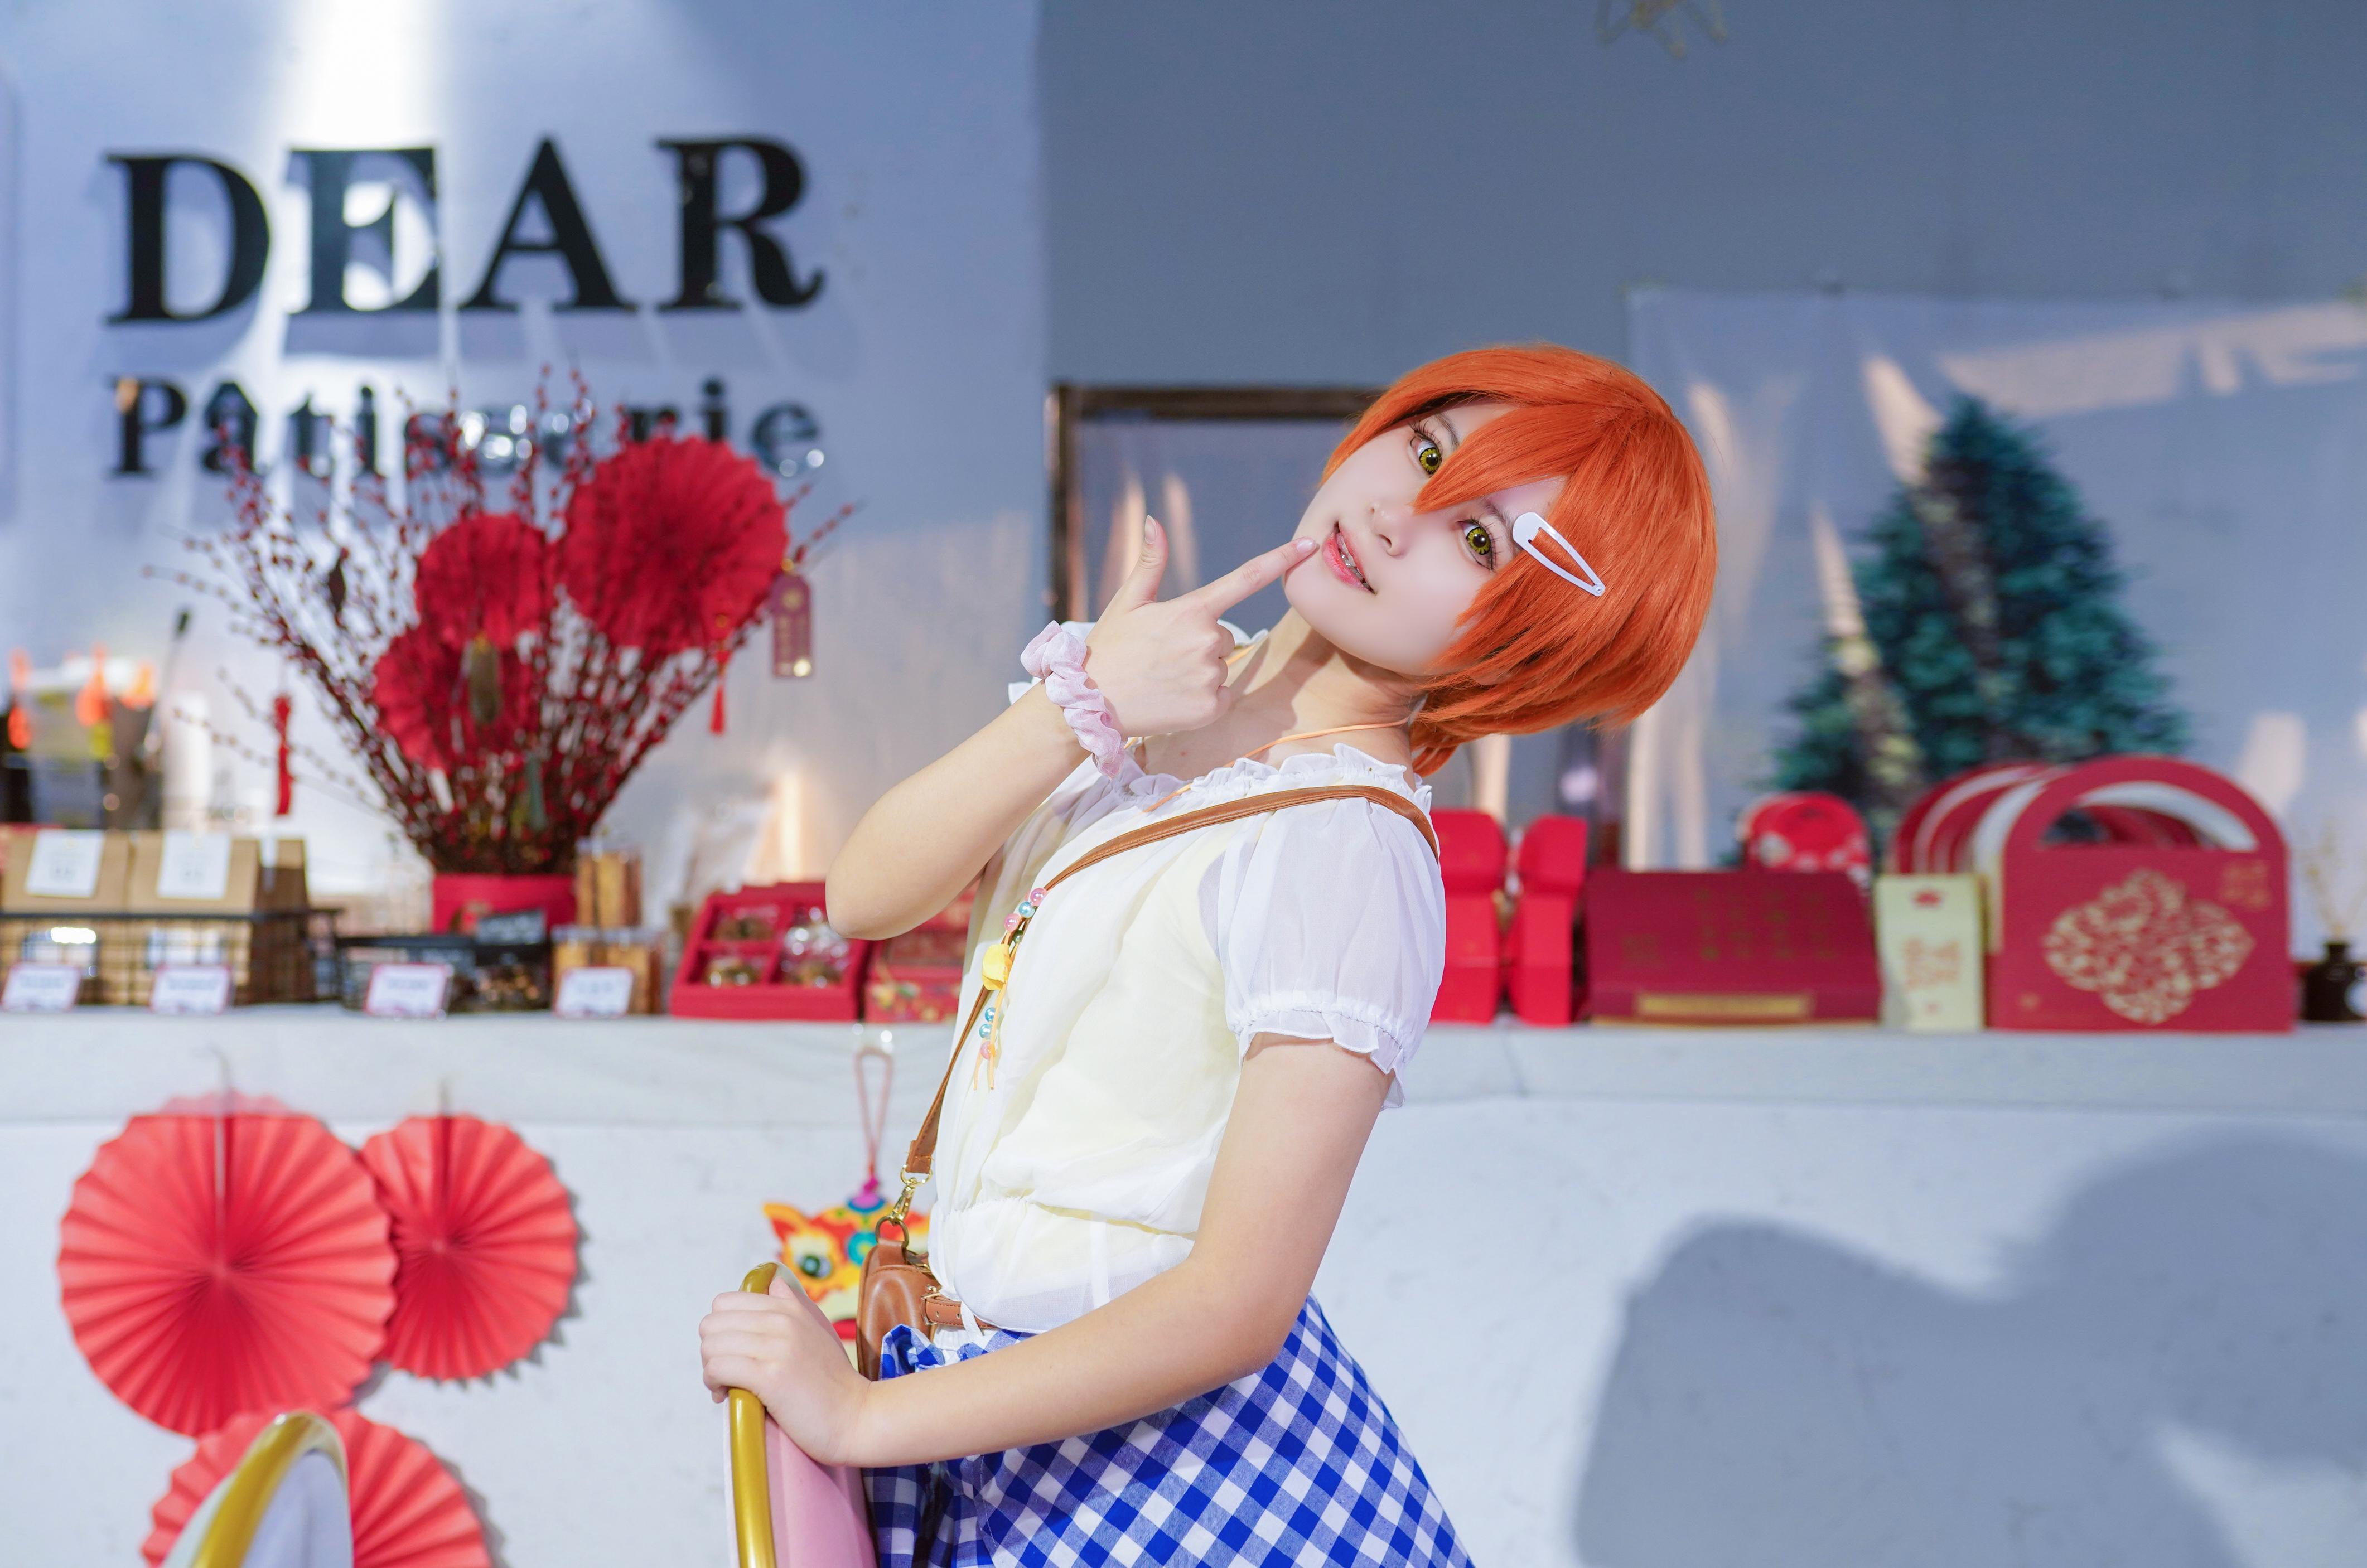 《LOVE LIVE!》少女cosplay【CN:_李笑颜Lee】-第6张